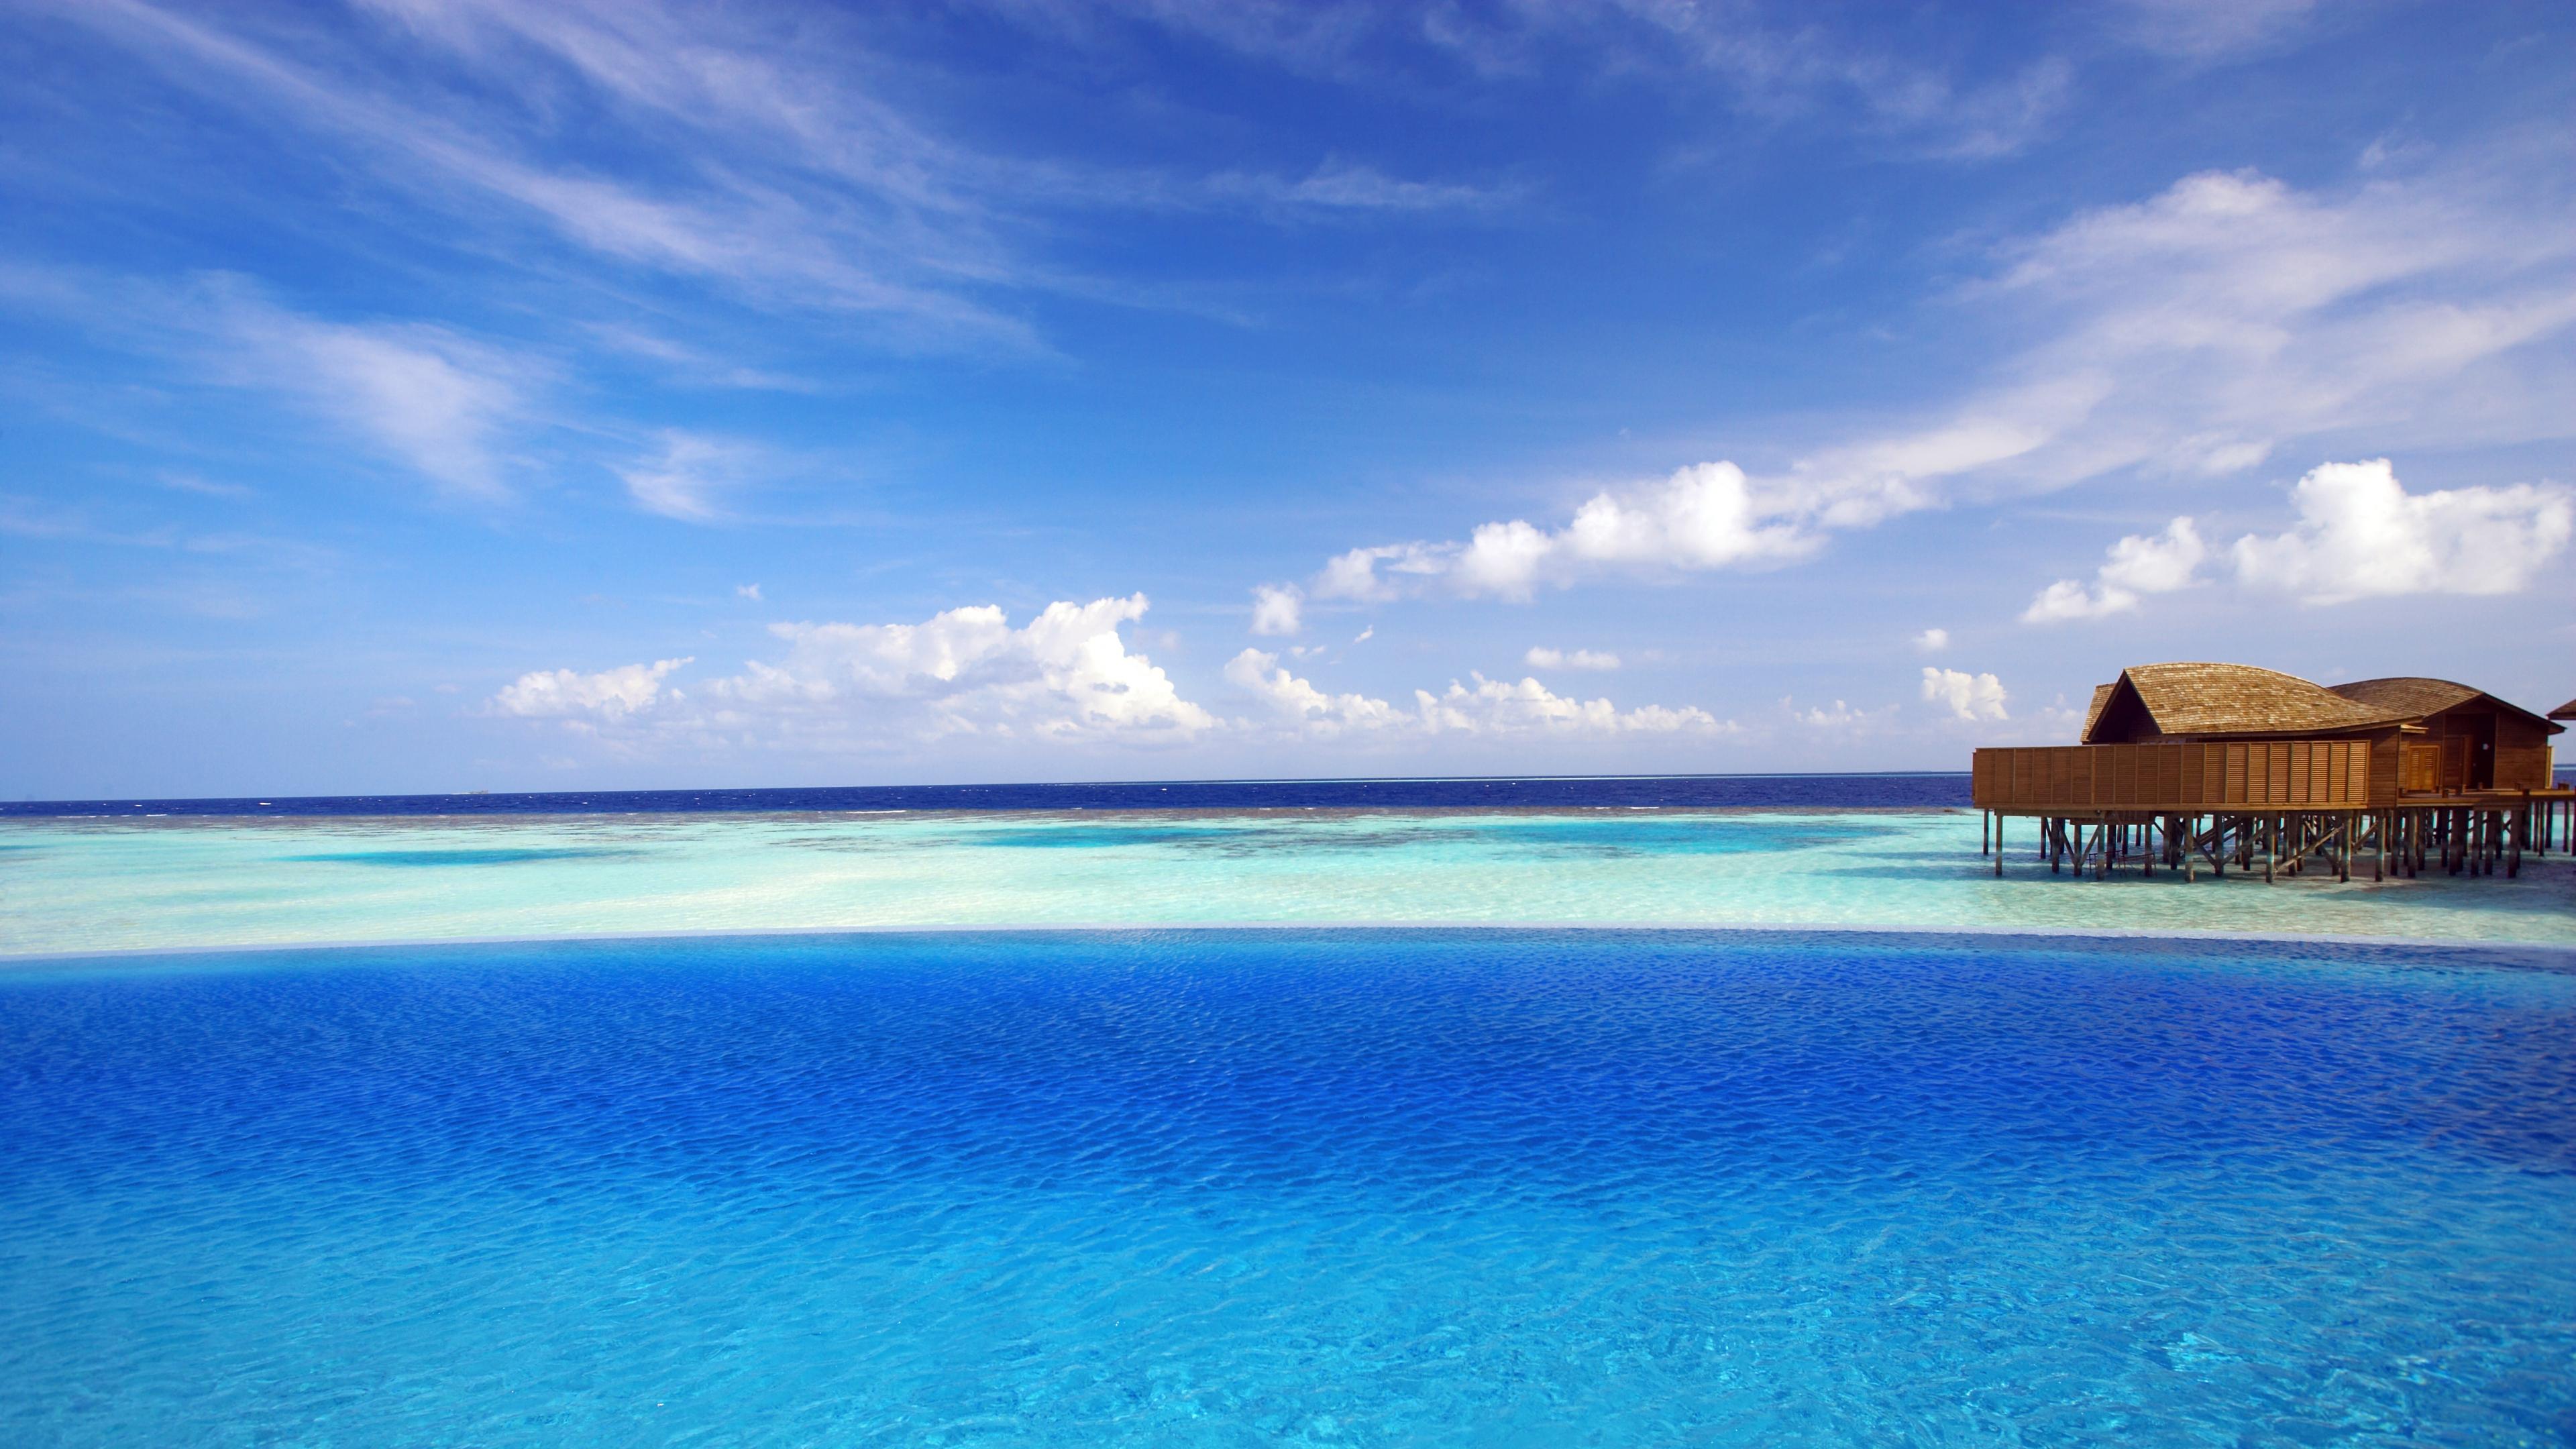 Download Wallpaper 3840x2160 maldives tropical bungalows ocean 4K 3840x2160